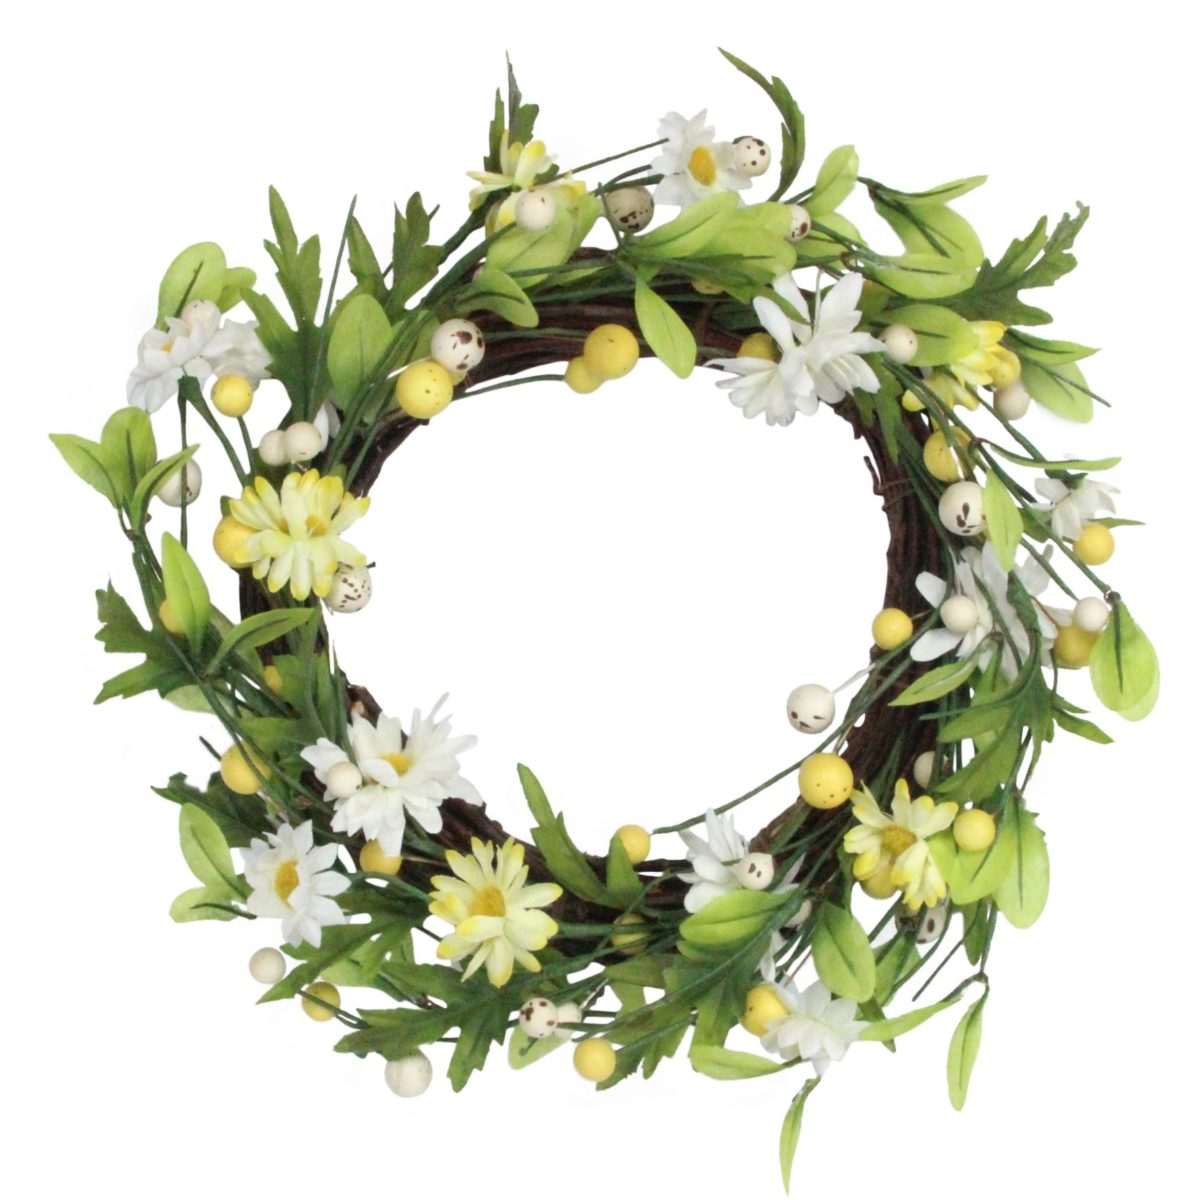 obr.6_the-contemporary-home-_yellow-white-daisy-wreath-al30.00-1200x1200.jpg